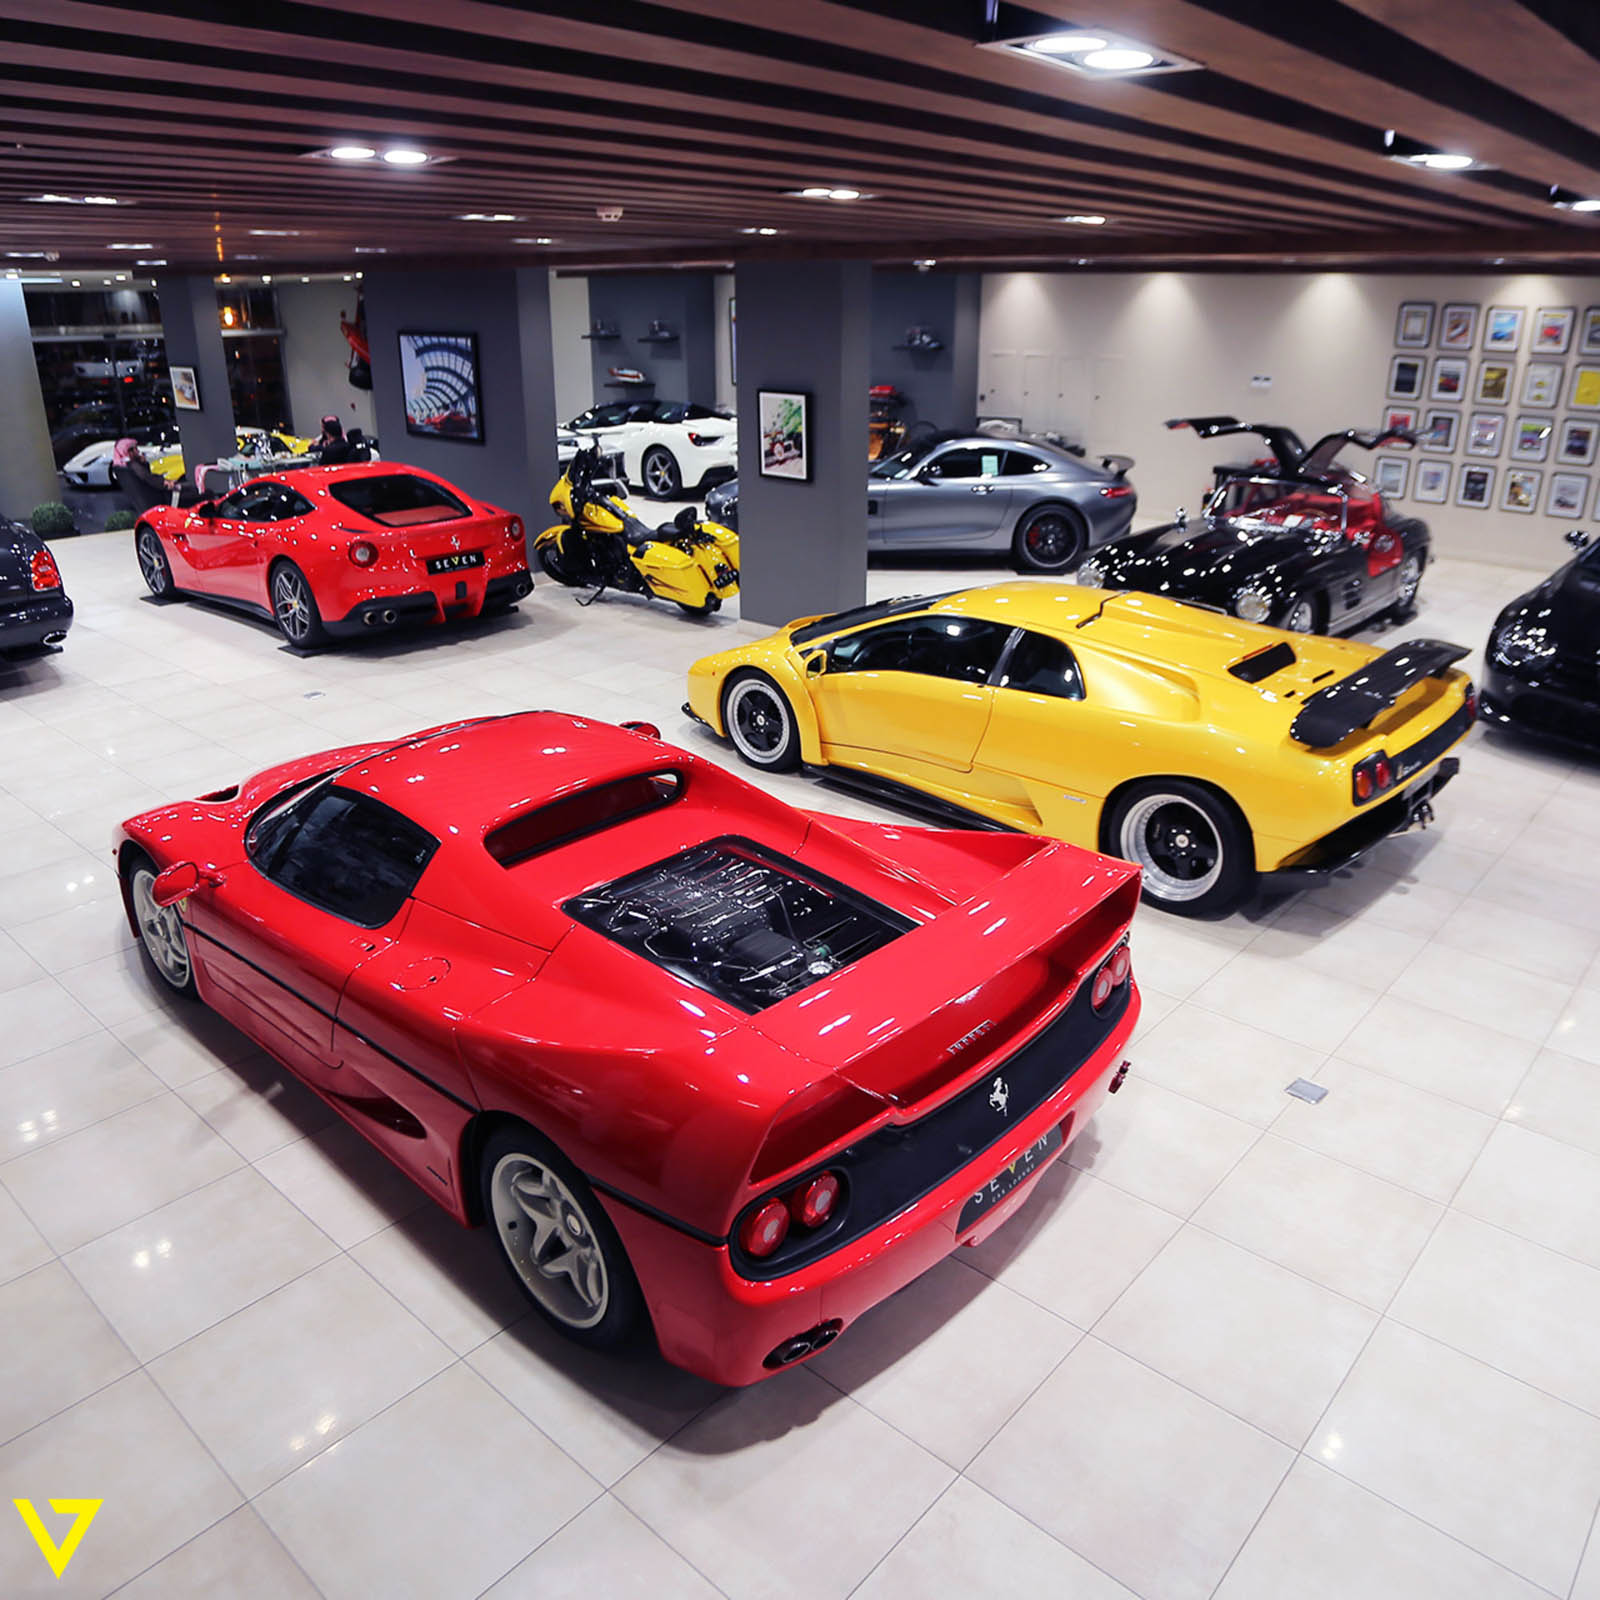 Auto Ferrari: Saudi Dealership Has All Four Of Ferrari's Flagship